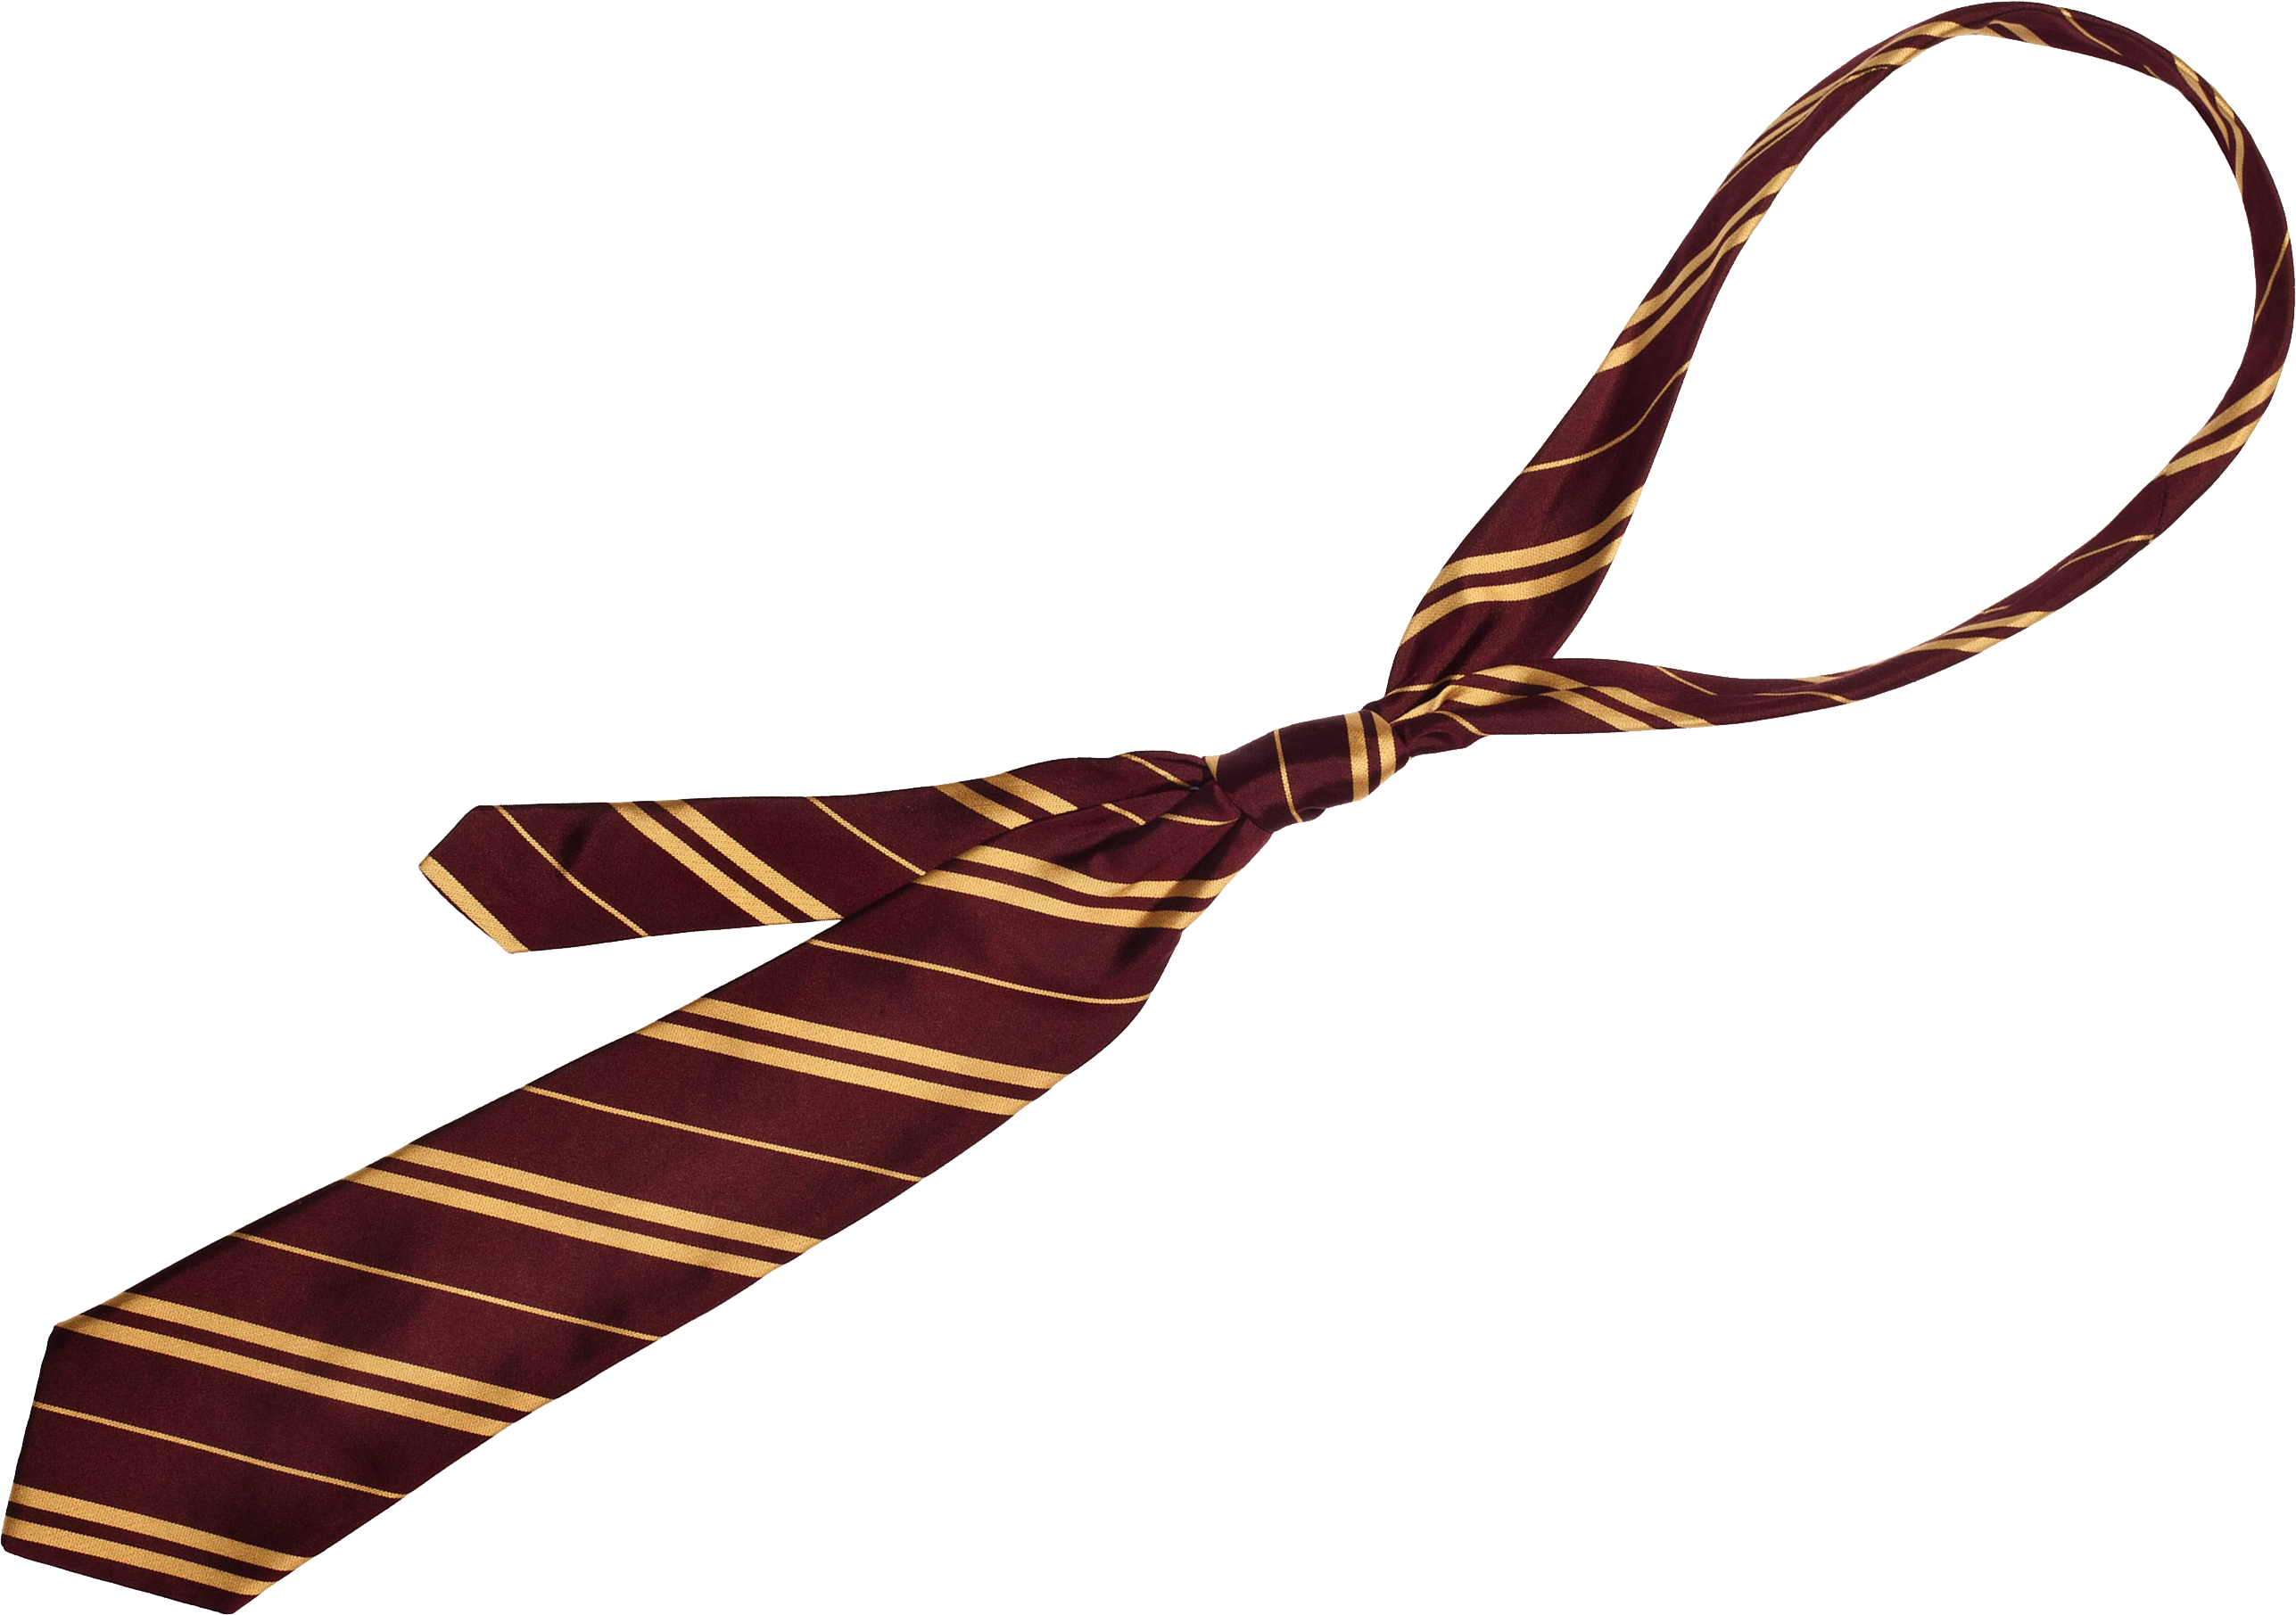 Neck clipart transparent. Tie png image free